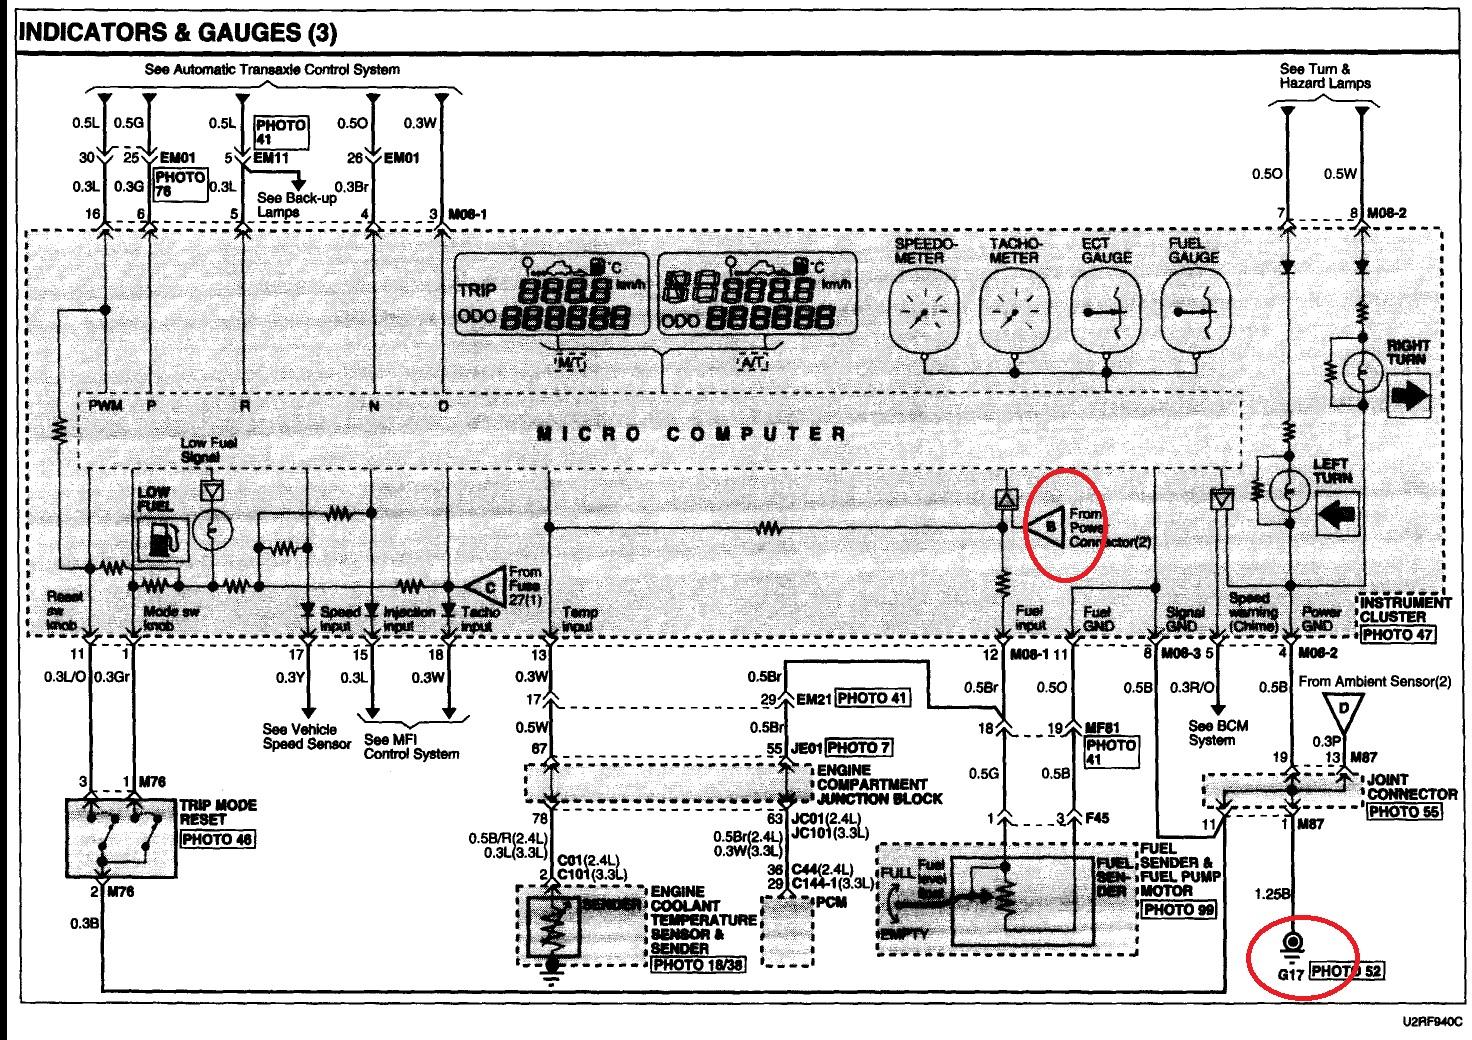 Hyundai santa fe wiring diagram pdf wiring diagram marvellous hyundai excel wiring diagram contemporary best image hyundai santa fe steering fine hyundai accent wiring swarovskicordoba Gallery